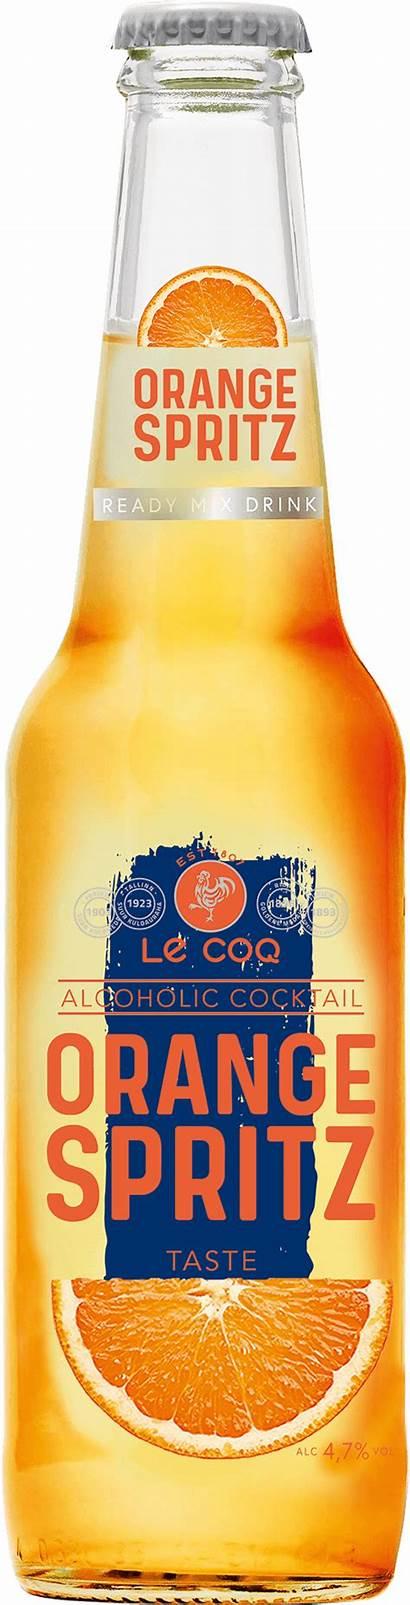 Spritz Orange Coq Cocktail Olvi Bottles Gr